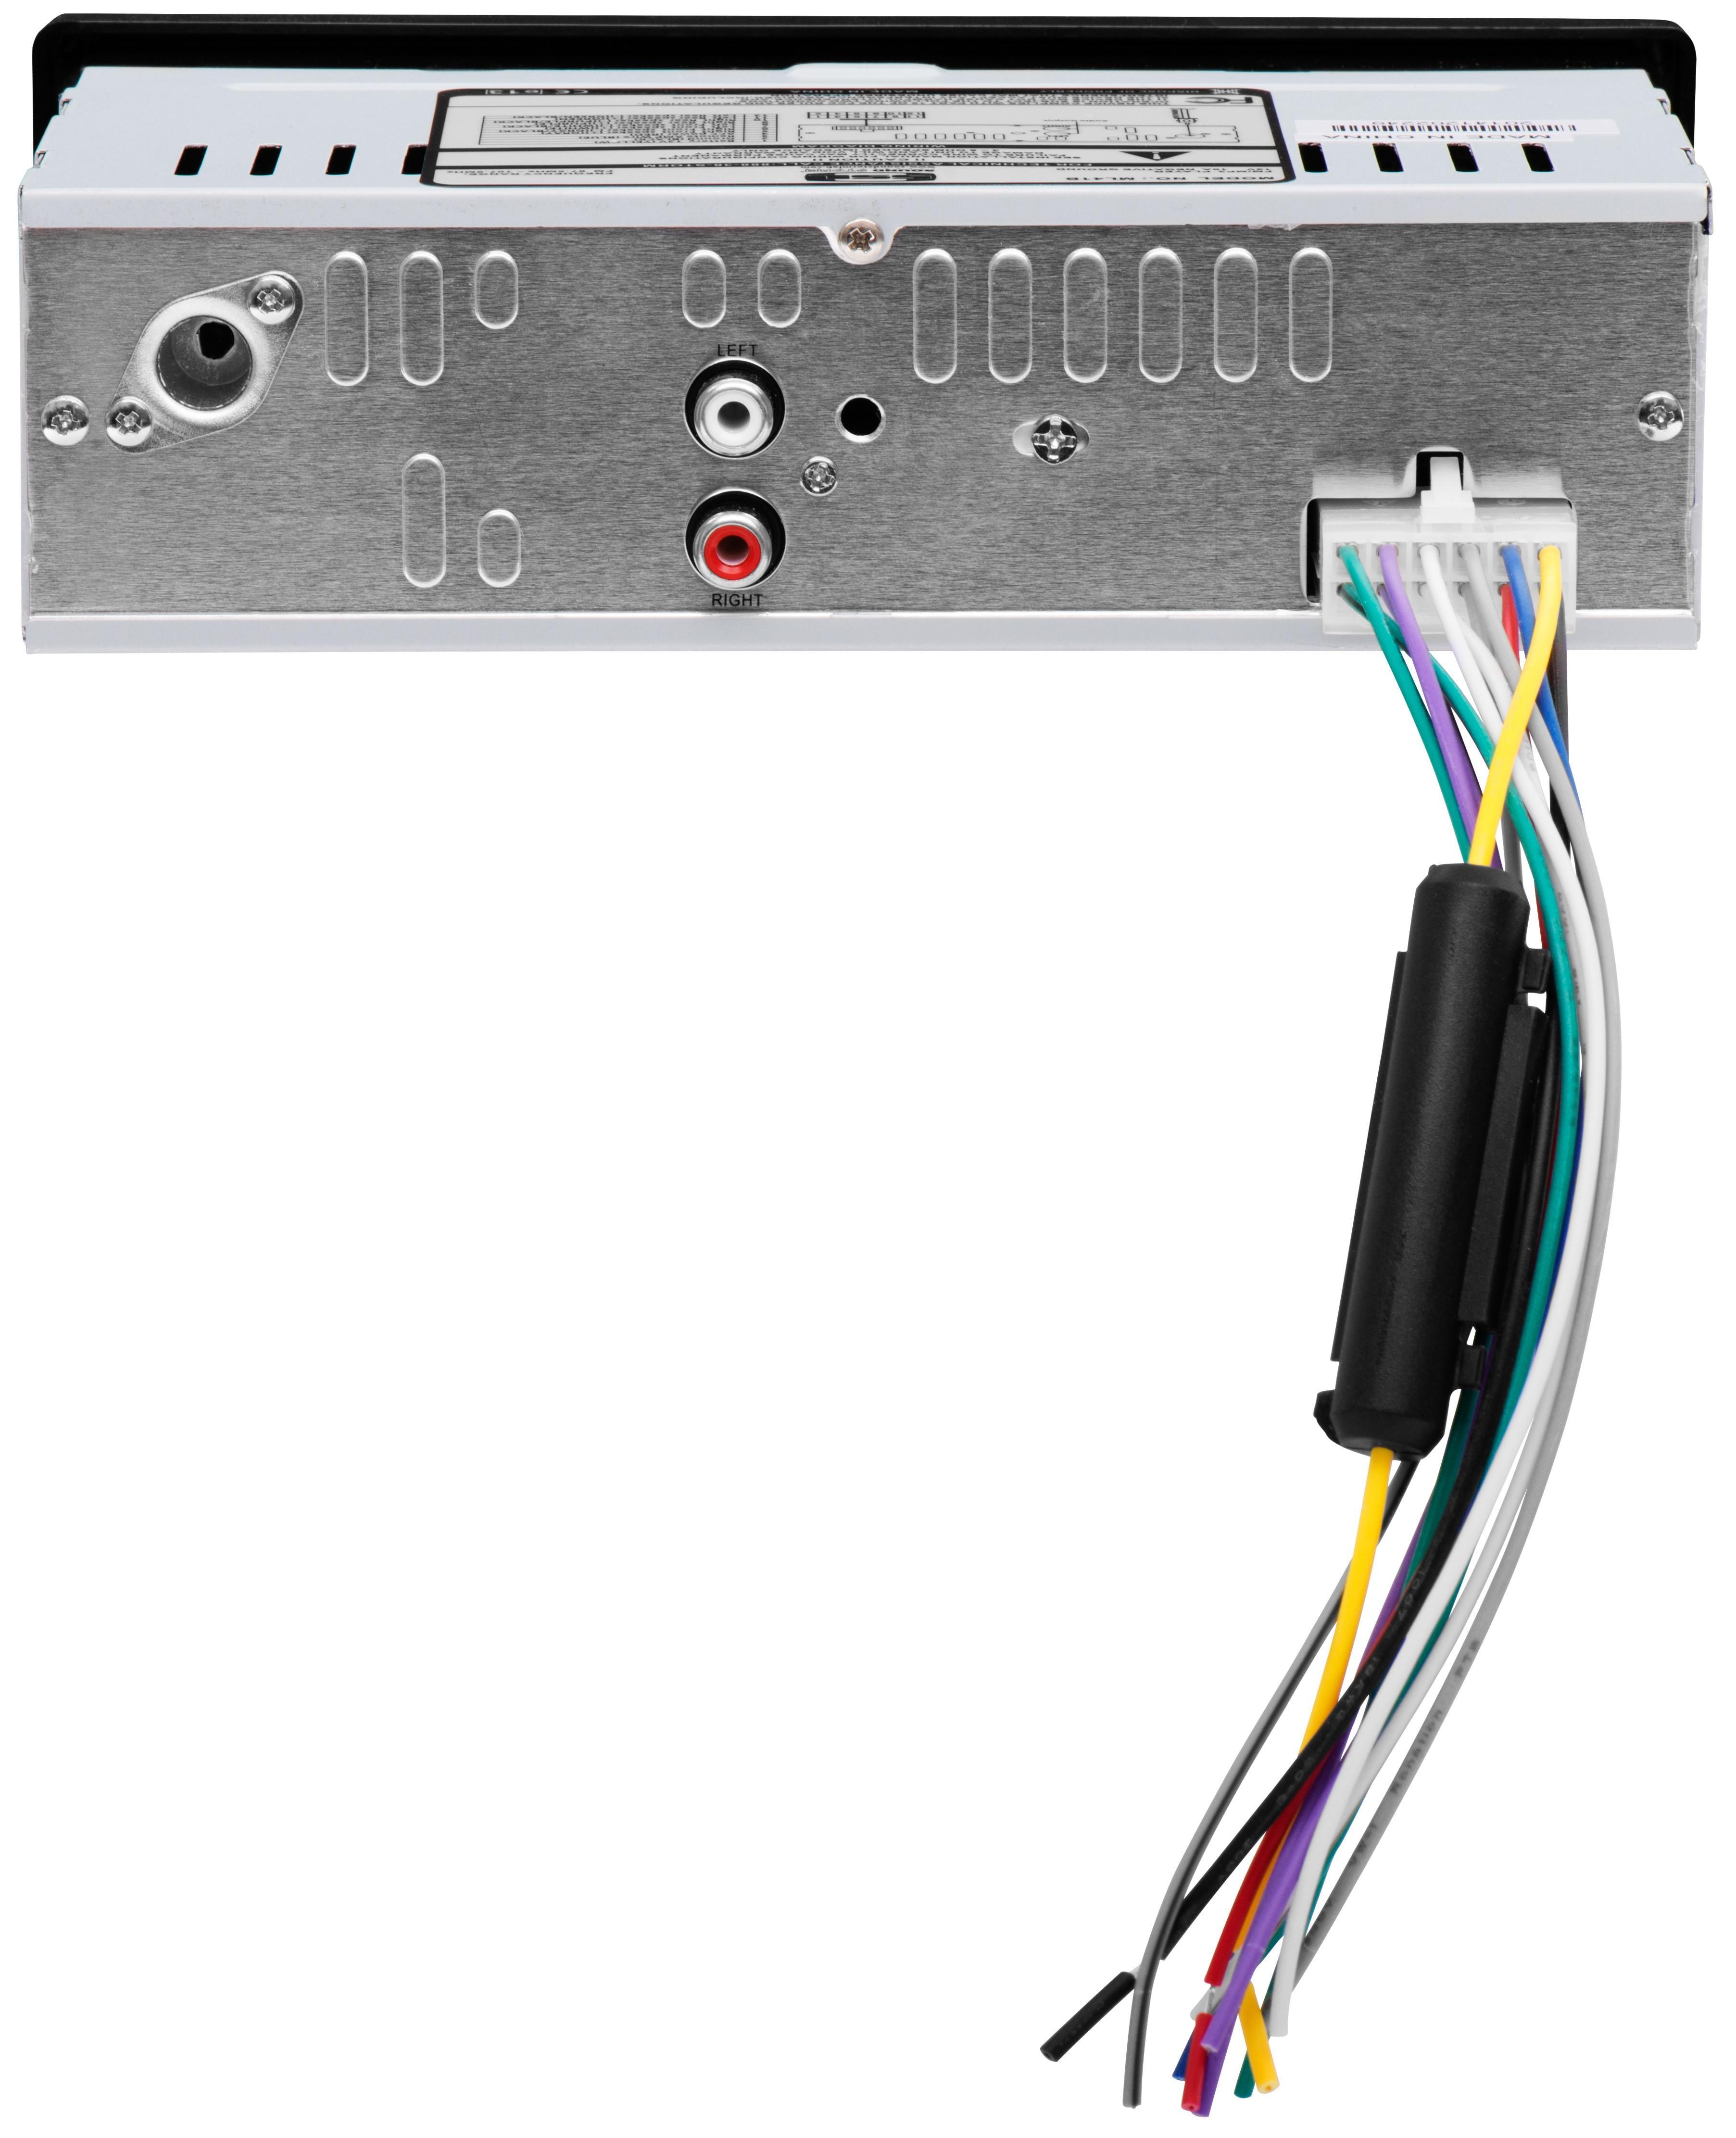 saturn l200 wiring diagram facbooik com Rosemount 8732e Wiring Diagram 2003 saturn vue alternator wiring diagram free download,vue free rosemount 8732e wiring diagram